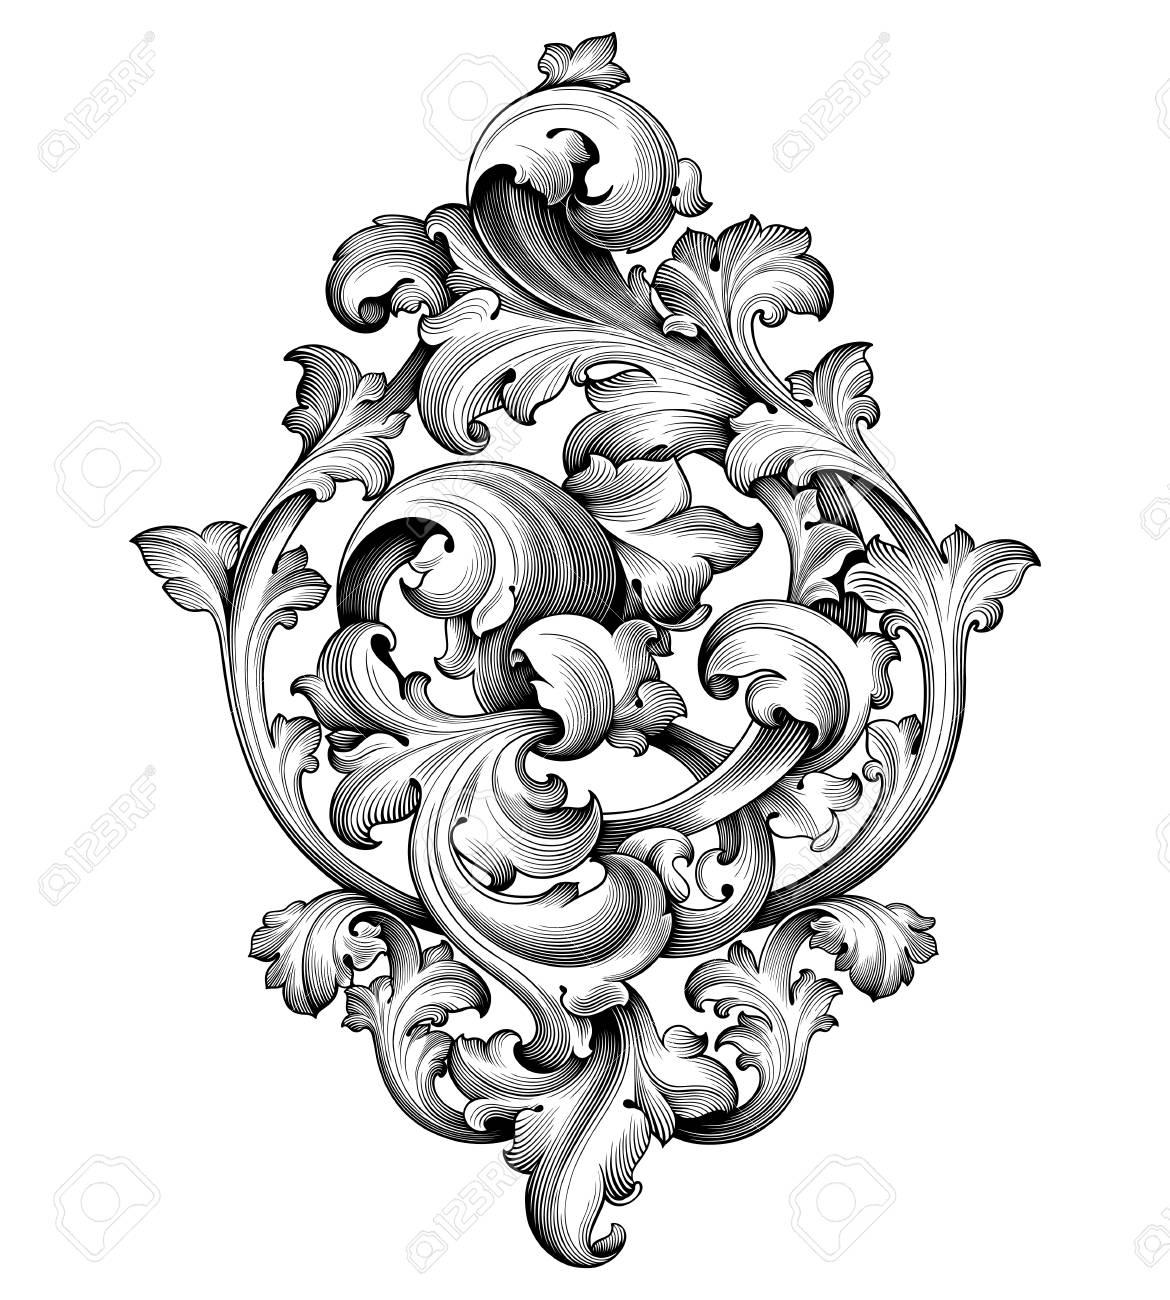 Vintage Baroque Victorian frame border corner monogram floral ornament leaf scroll engraved retro flower pattern decorative design tattoo black and white filigree calligraphic vector heraldic shield - 88306558